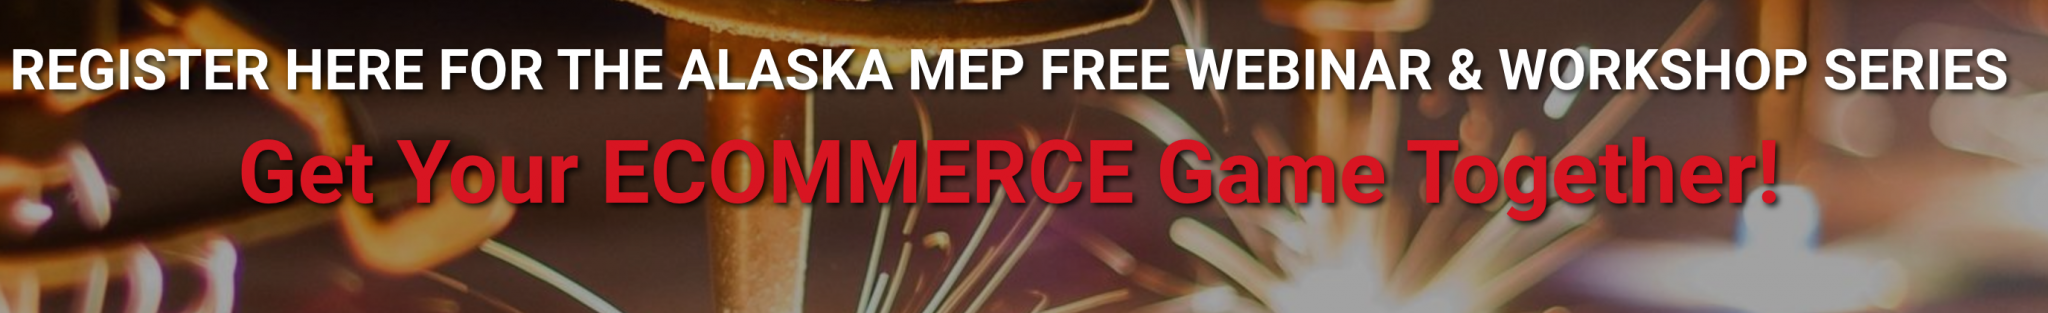 The Alaska MEP, The Alaska MEP Offers eCommerce Workshop Featuring Falconer Electronics